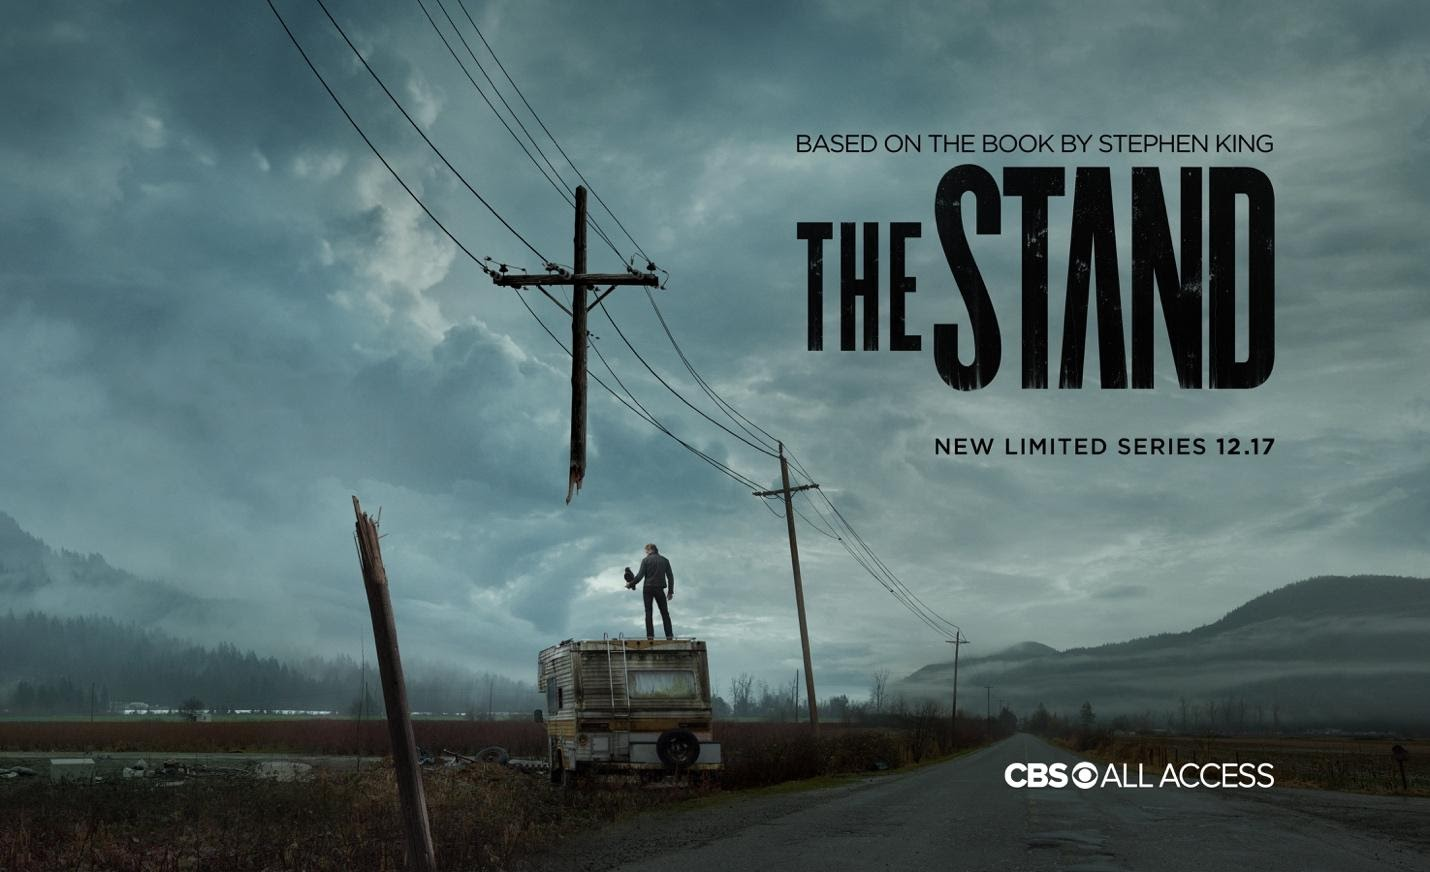 The Stand' Trailer Gives Alexander Skarsgård the Spotlight - Variety